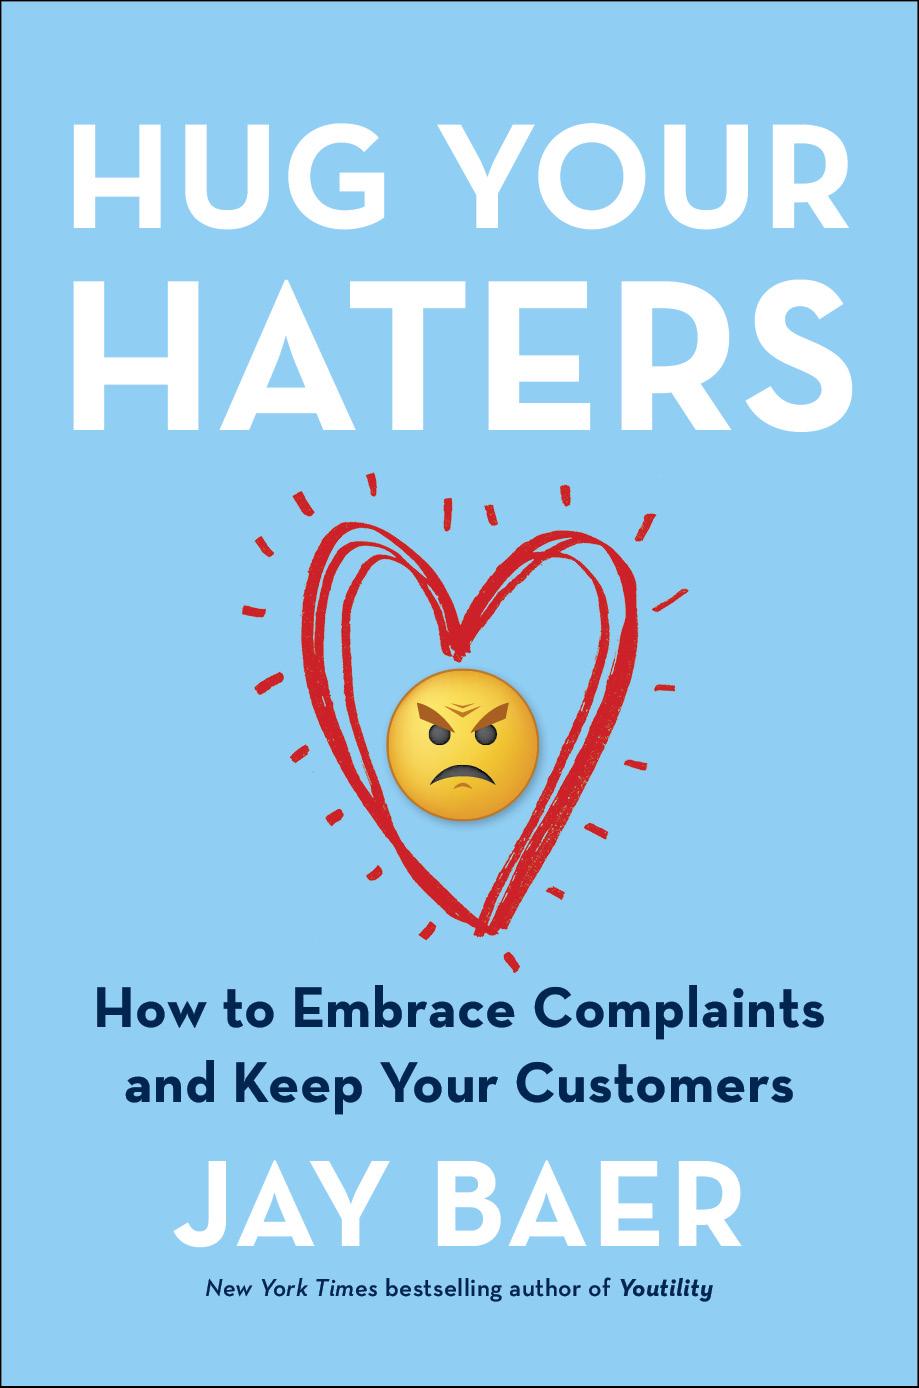 best-marketing-books-2017-hug-your-haters.jpg